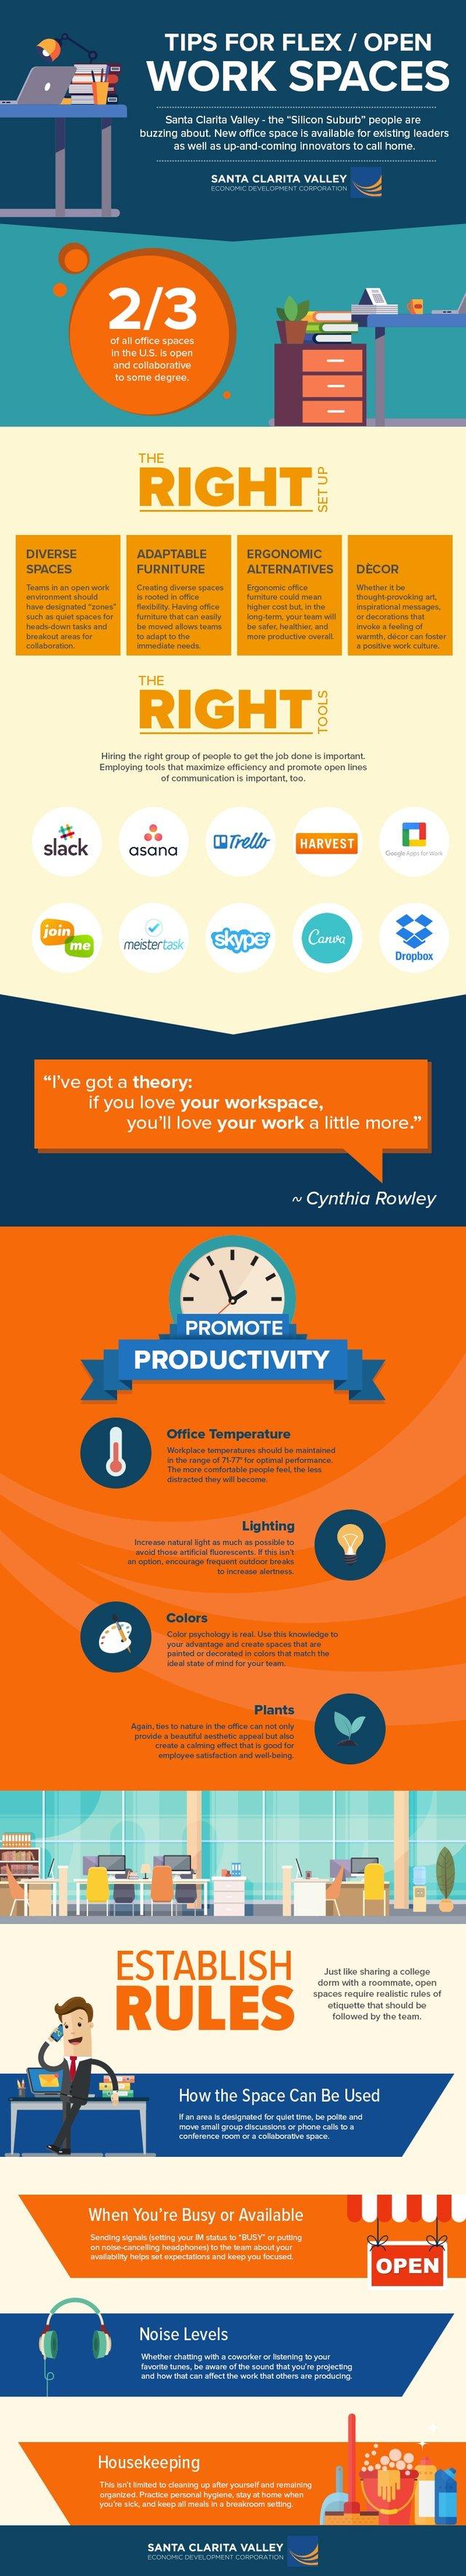 SCVEDC - Open Work Spaces - Infographic 9.18.17.jpg